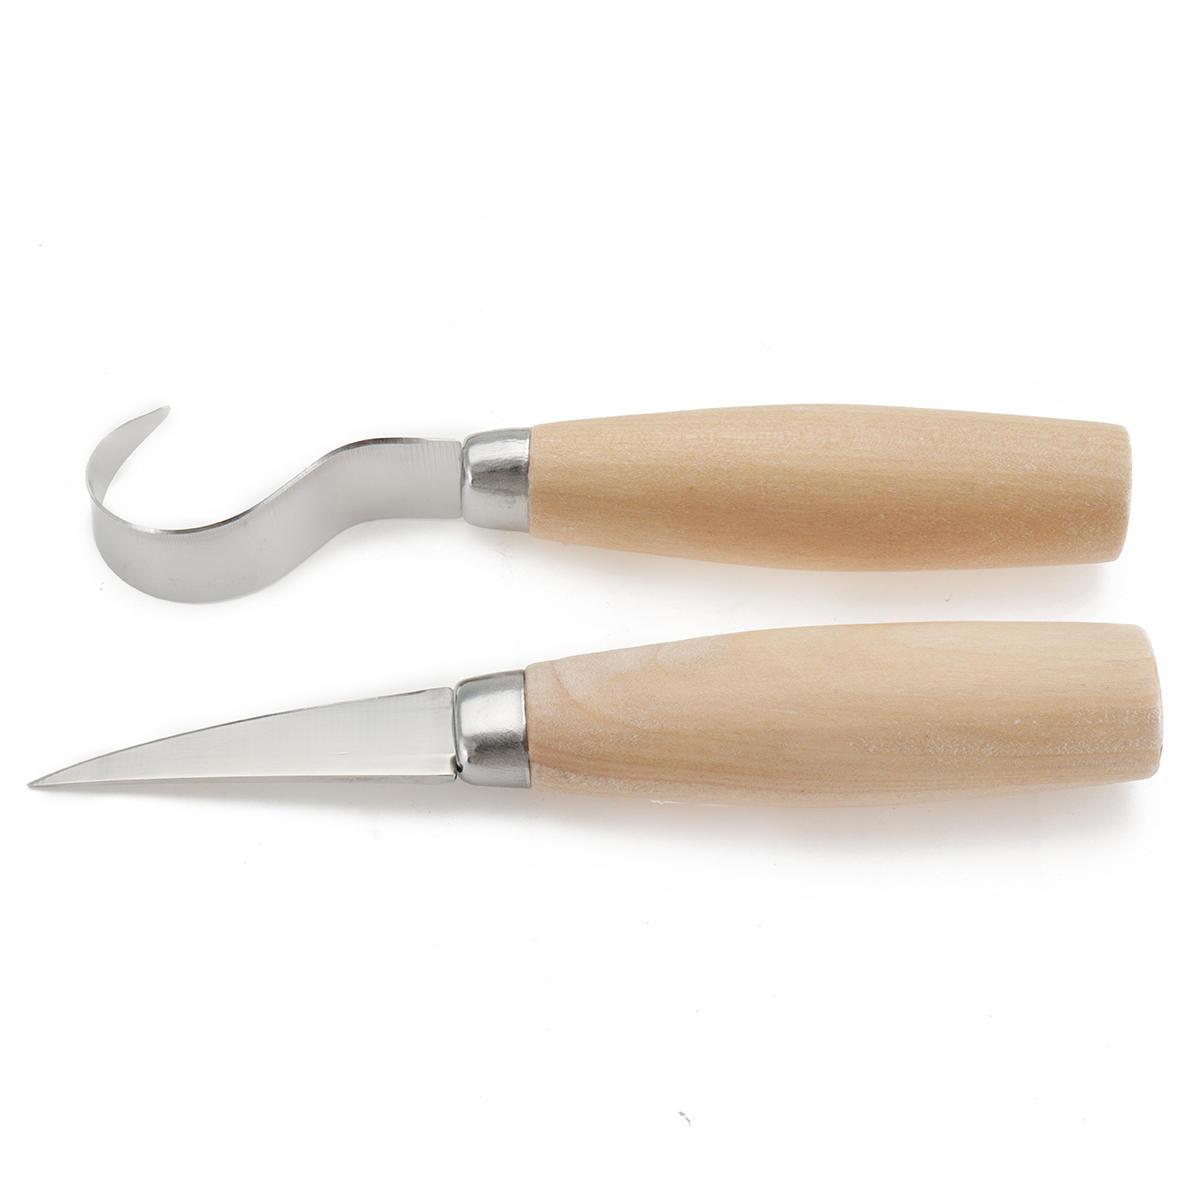 2pcs Spoon Wood Carving Chisel Top Set Woodcarving Tool Hook Whittling Beaver Craf Set